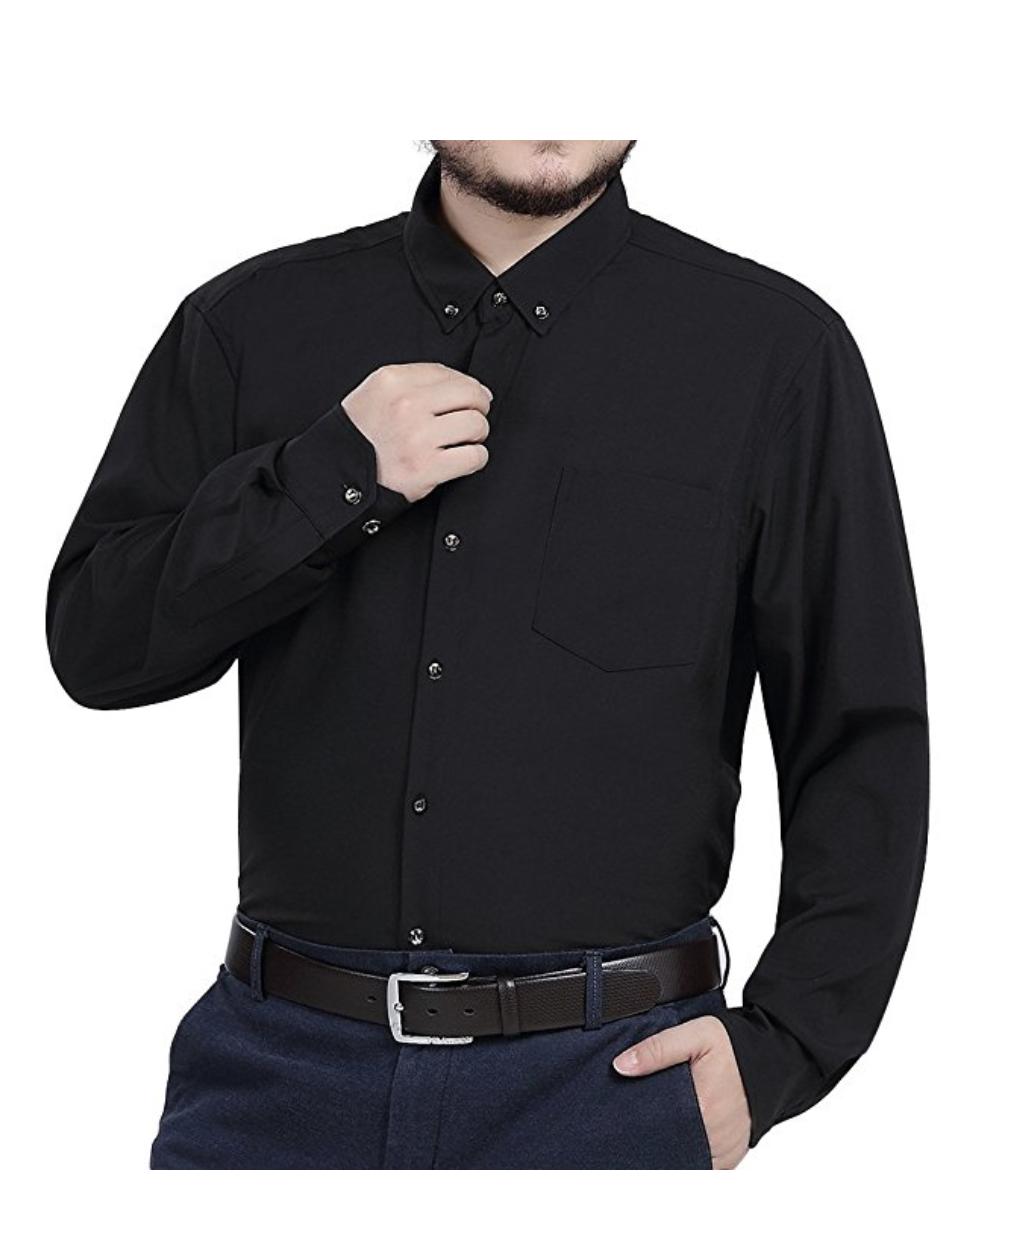 a59e3b99a79 Jeopace Mens Button Down Long Sleeve Stretch Dress Shirt Big Tall ...